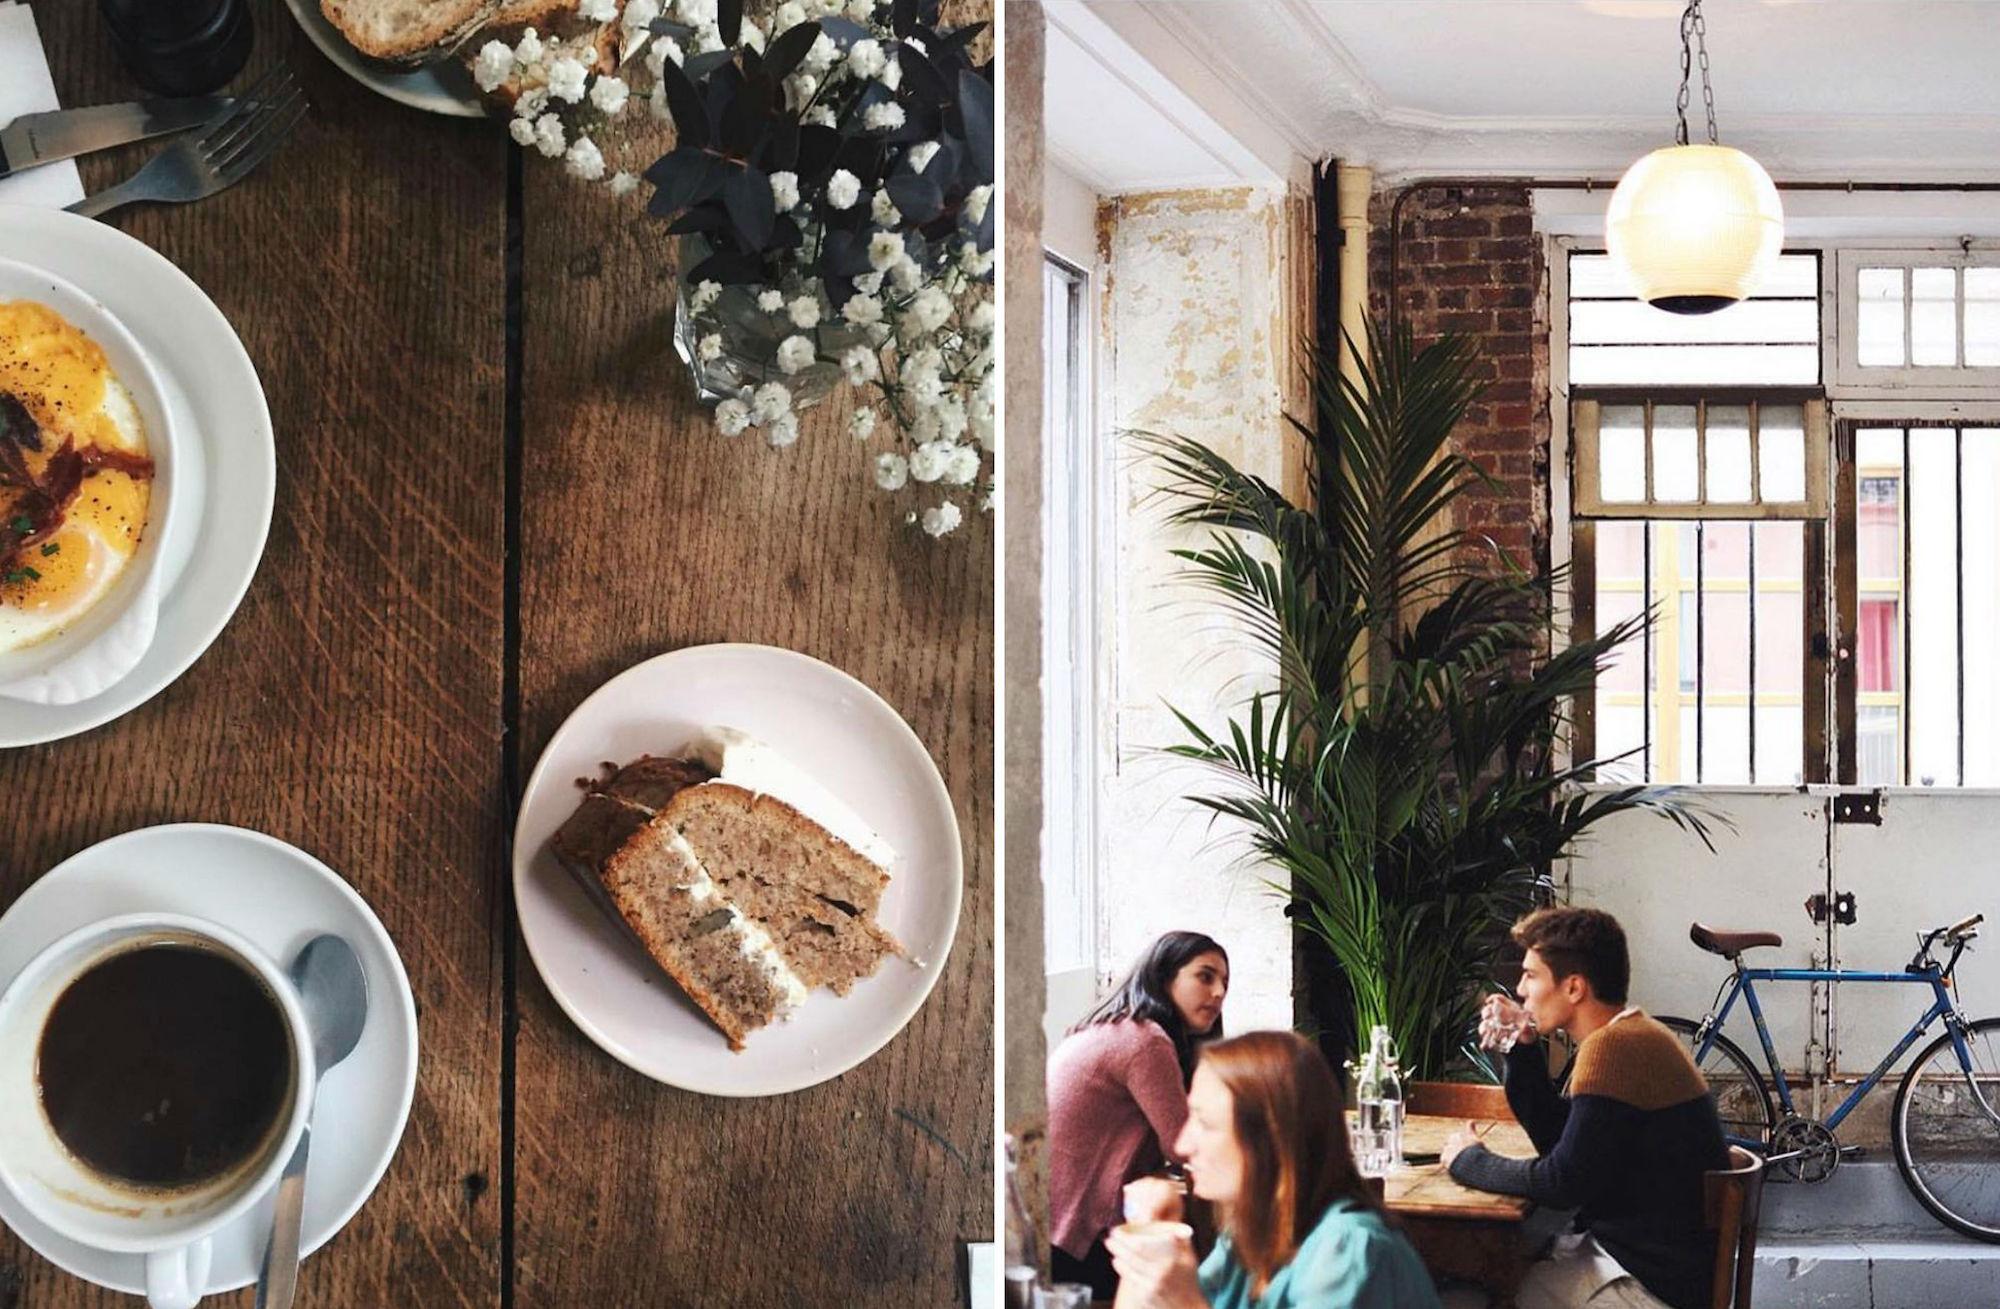 Erin Dahl shares her favorite addresses in Paris' Quartier d'Aligre on HiP Paris.